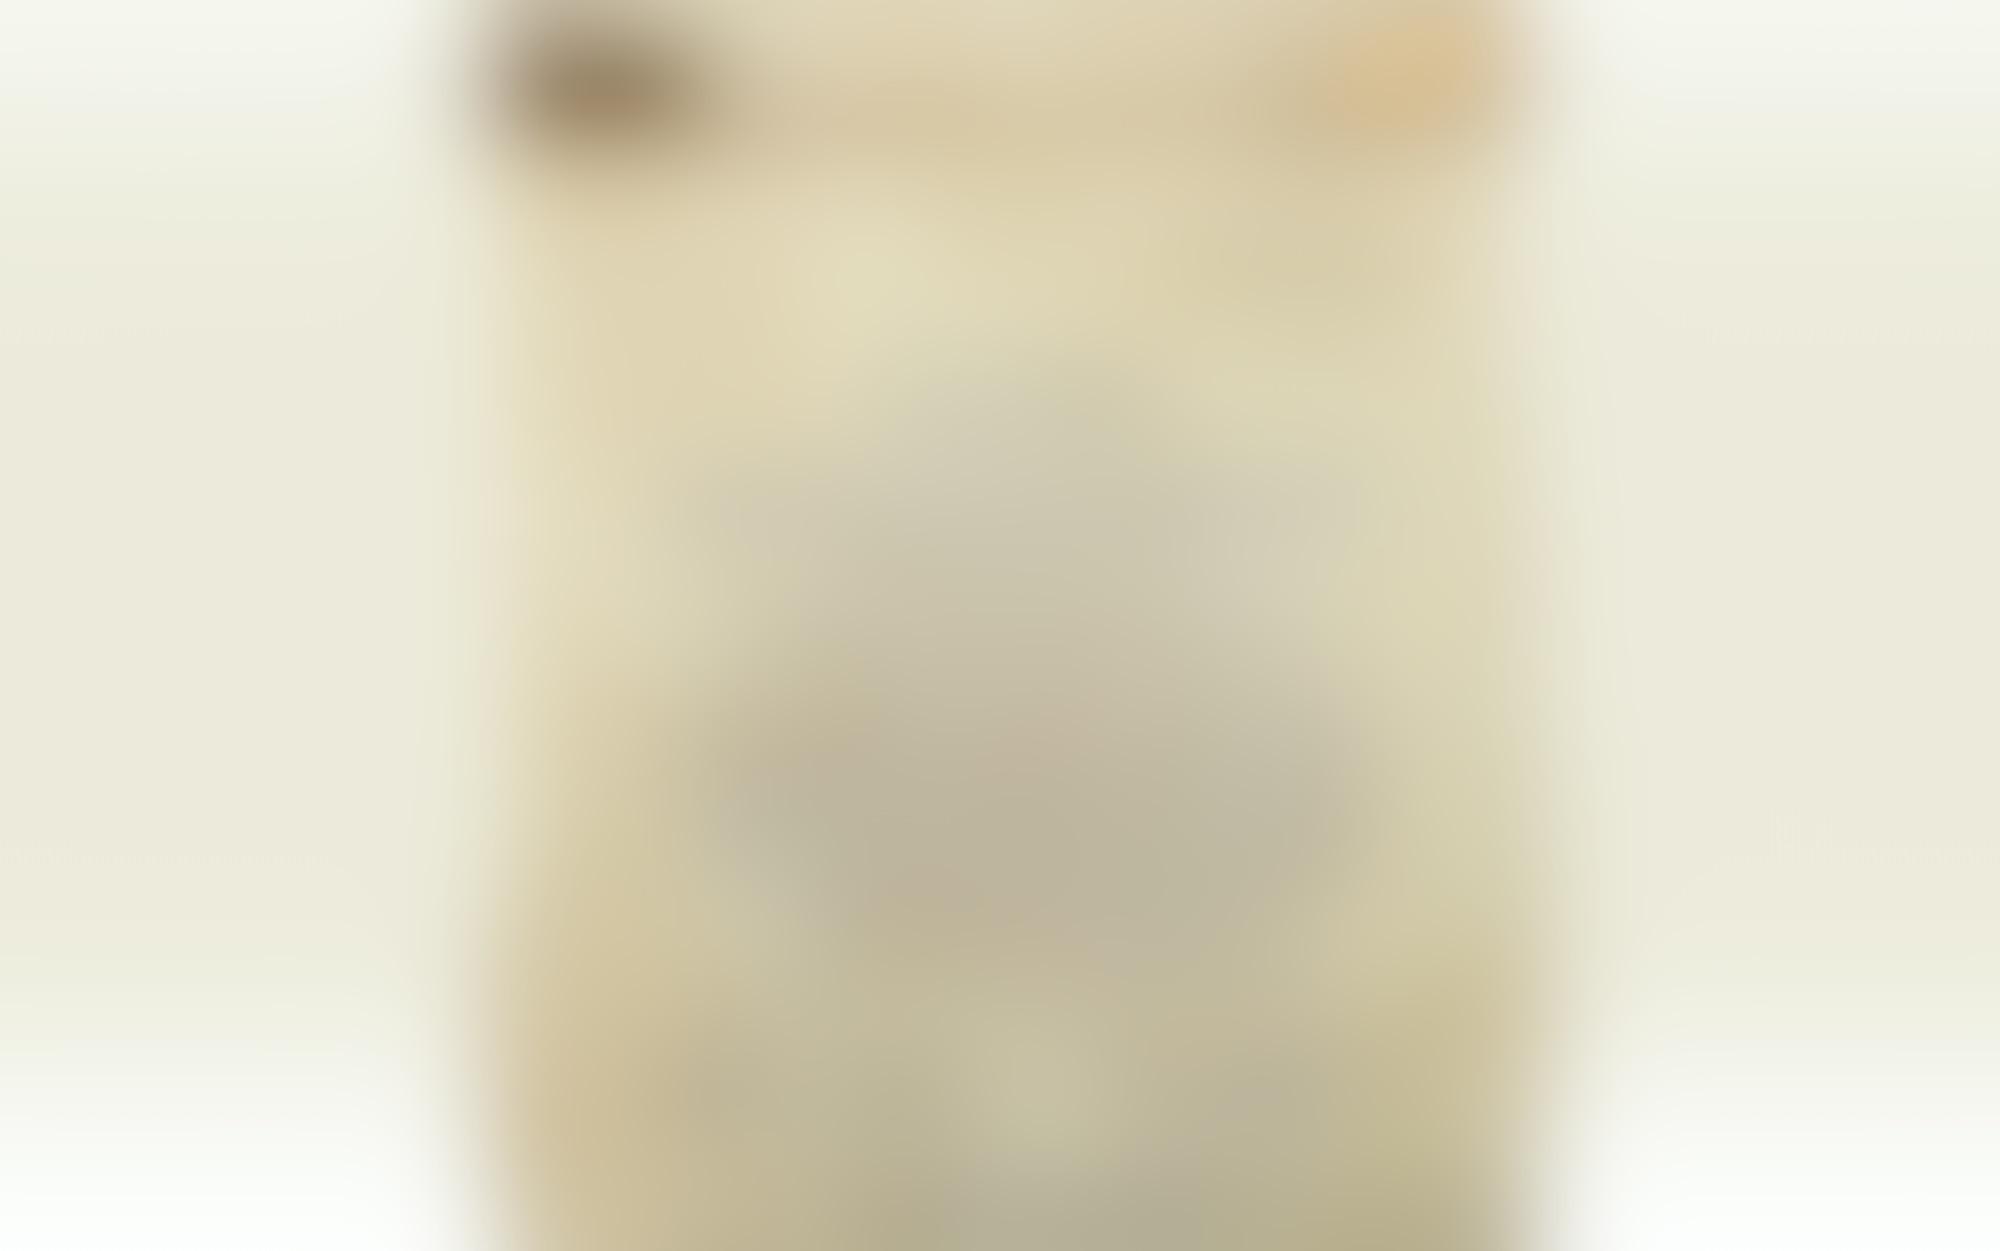 Union Coffee 006 autocompressfitresizeixlibphp 1 1 0max h2000max w3 D2000q80s9578273c4998bd2fecfc91706a96bf02